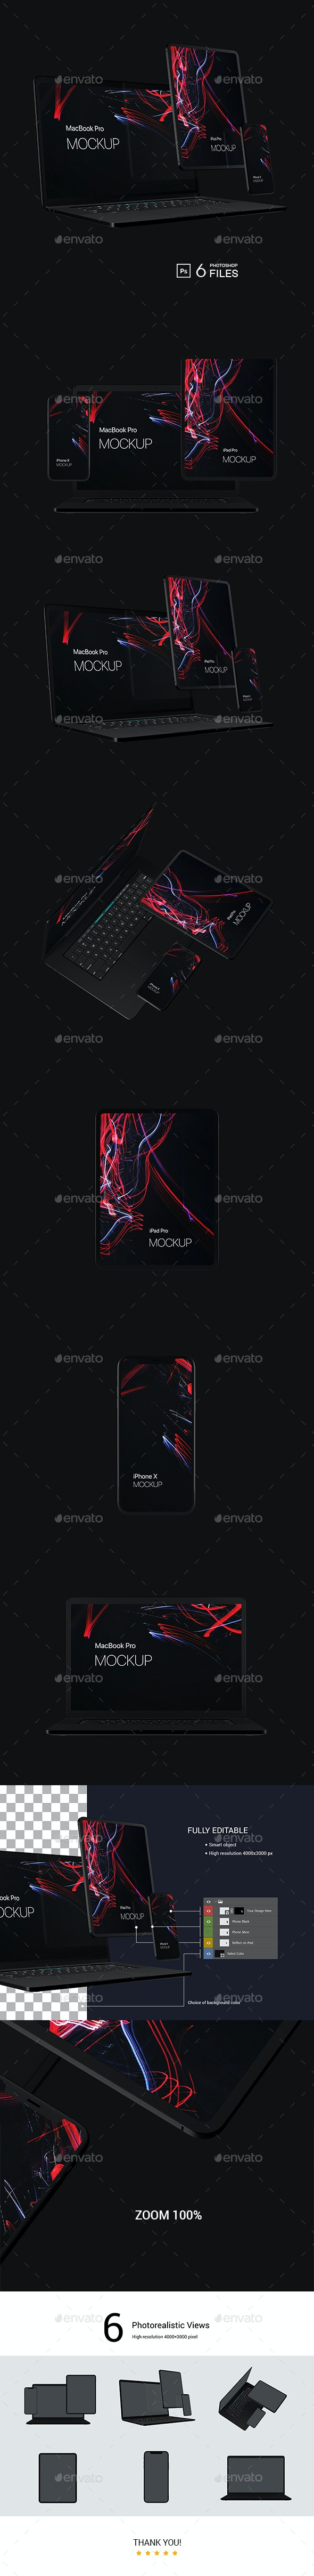 Black Devices Mockup - Displays Product Mock-Ups